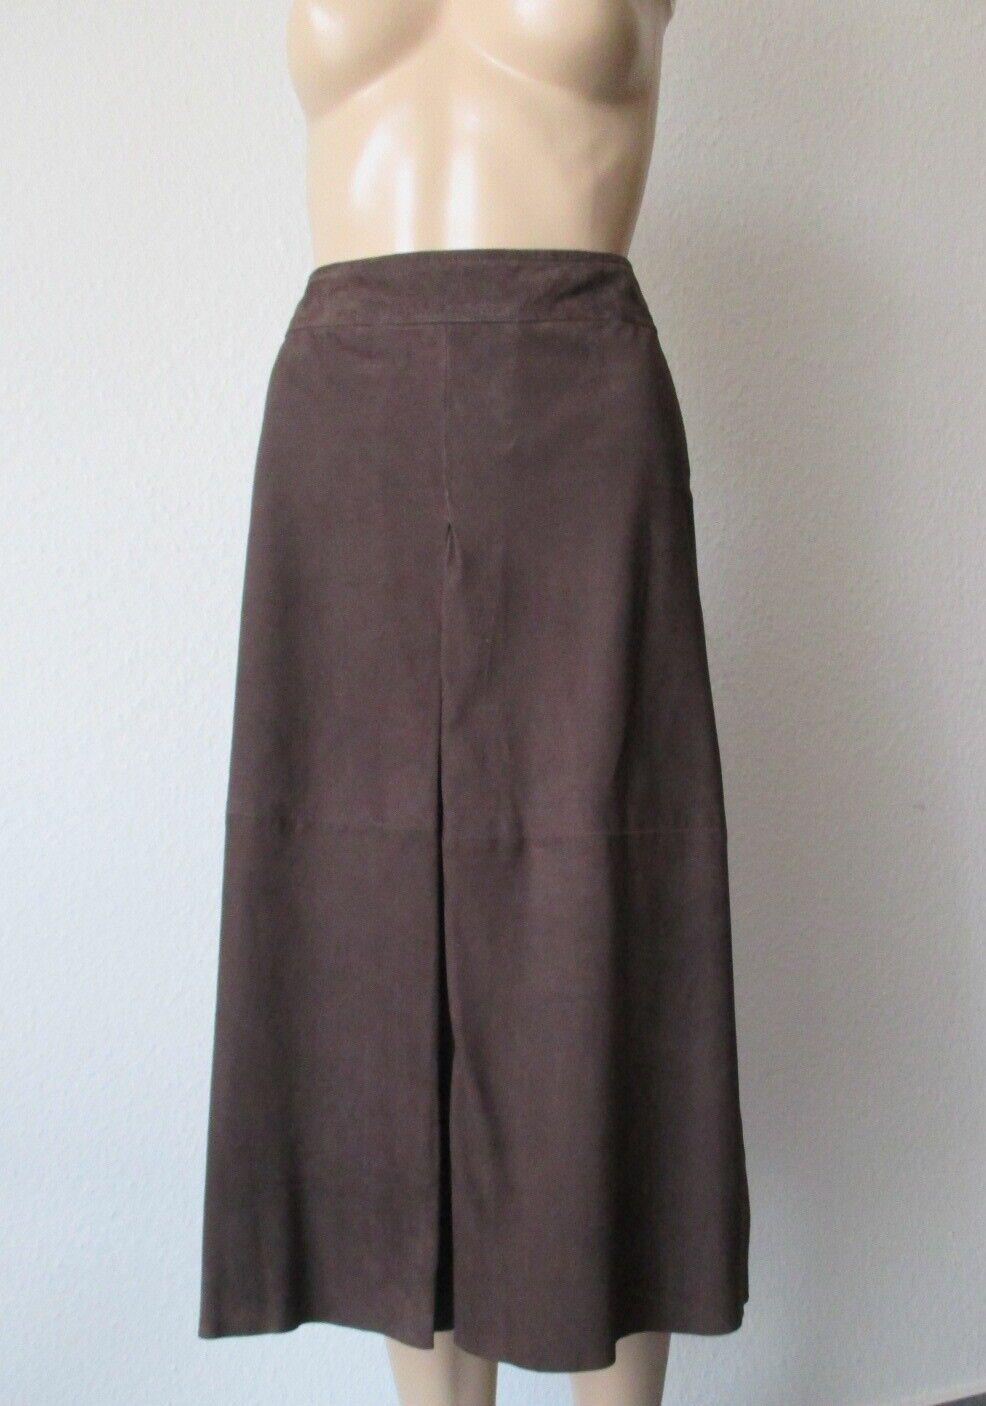 Riani Lederrock, knielang, in der Farbe  mGold  (braun) , Größe 40